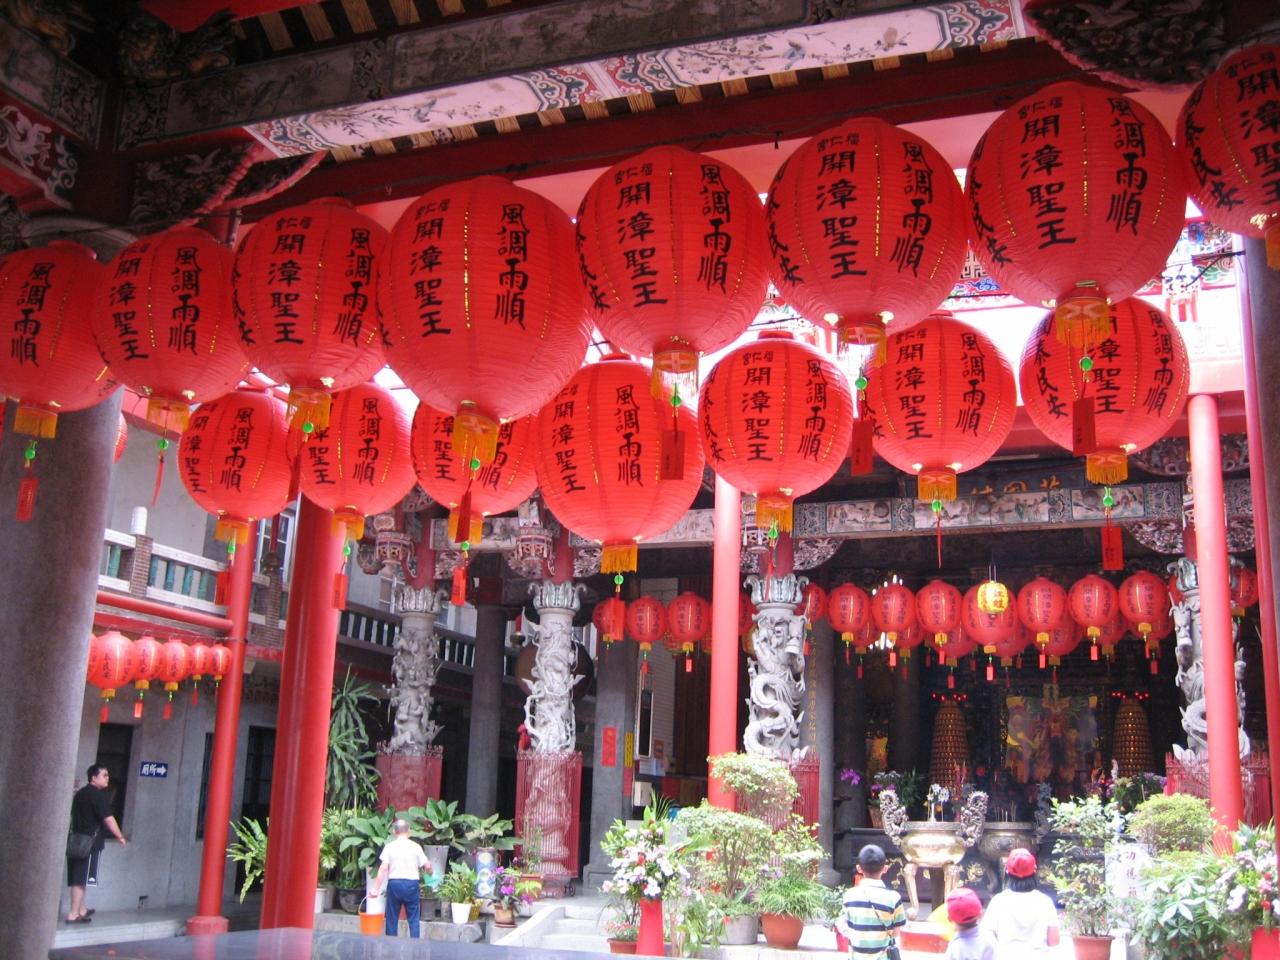 GW台湾東回り 桃園県大渓老街 和平路